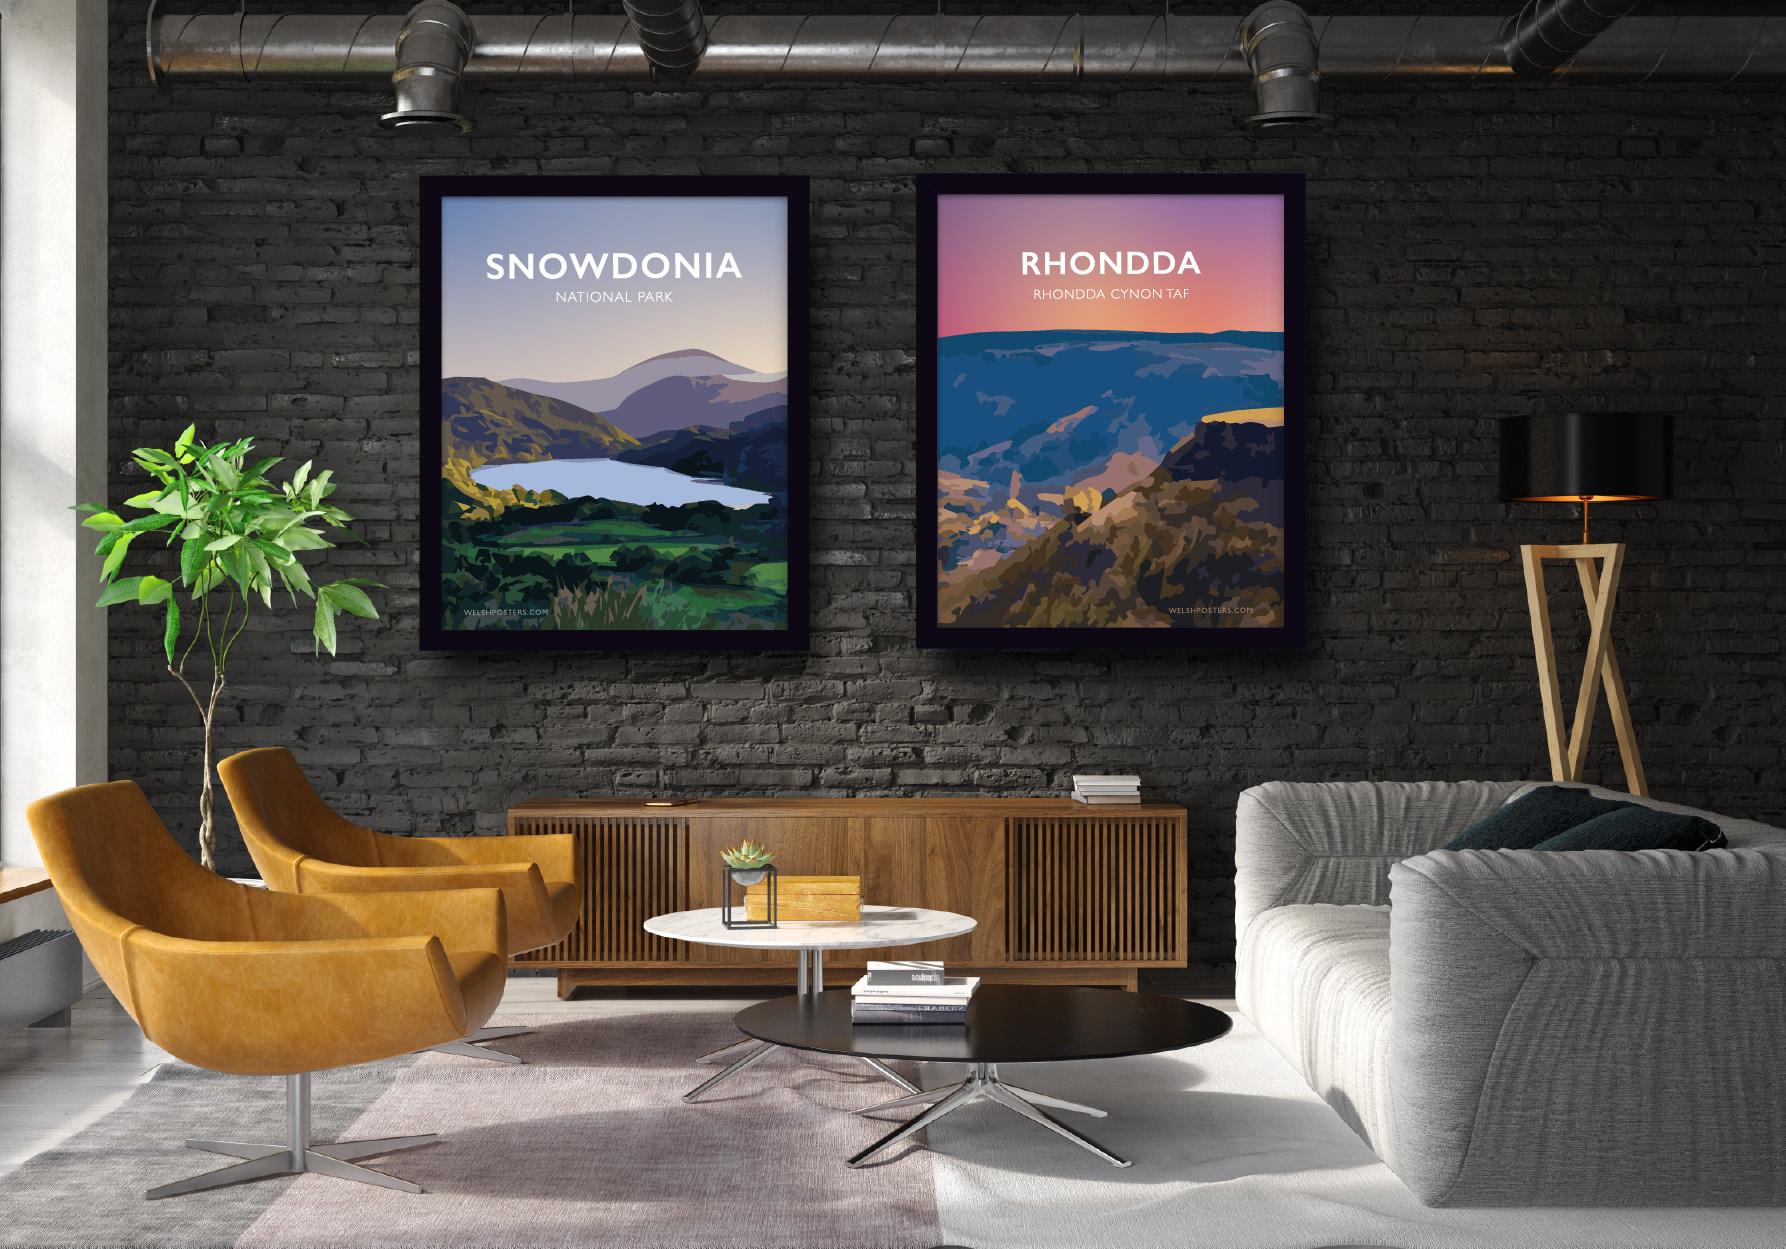 Welsh Posters Snowdonia and Rhondda Travel Posters